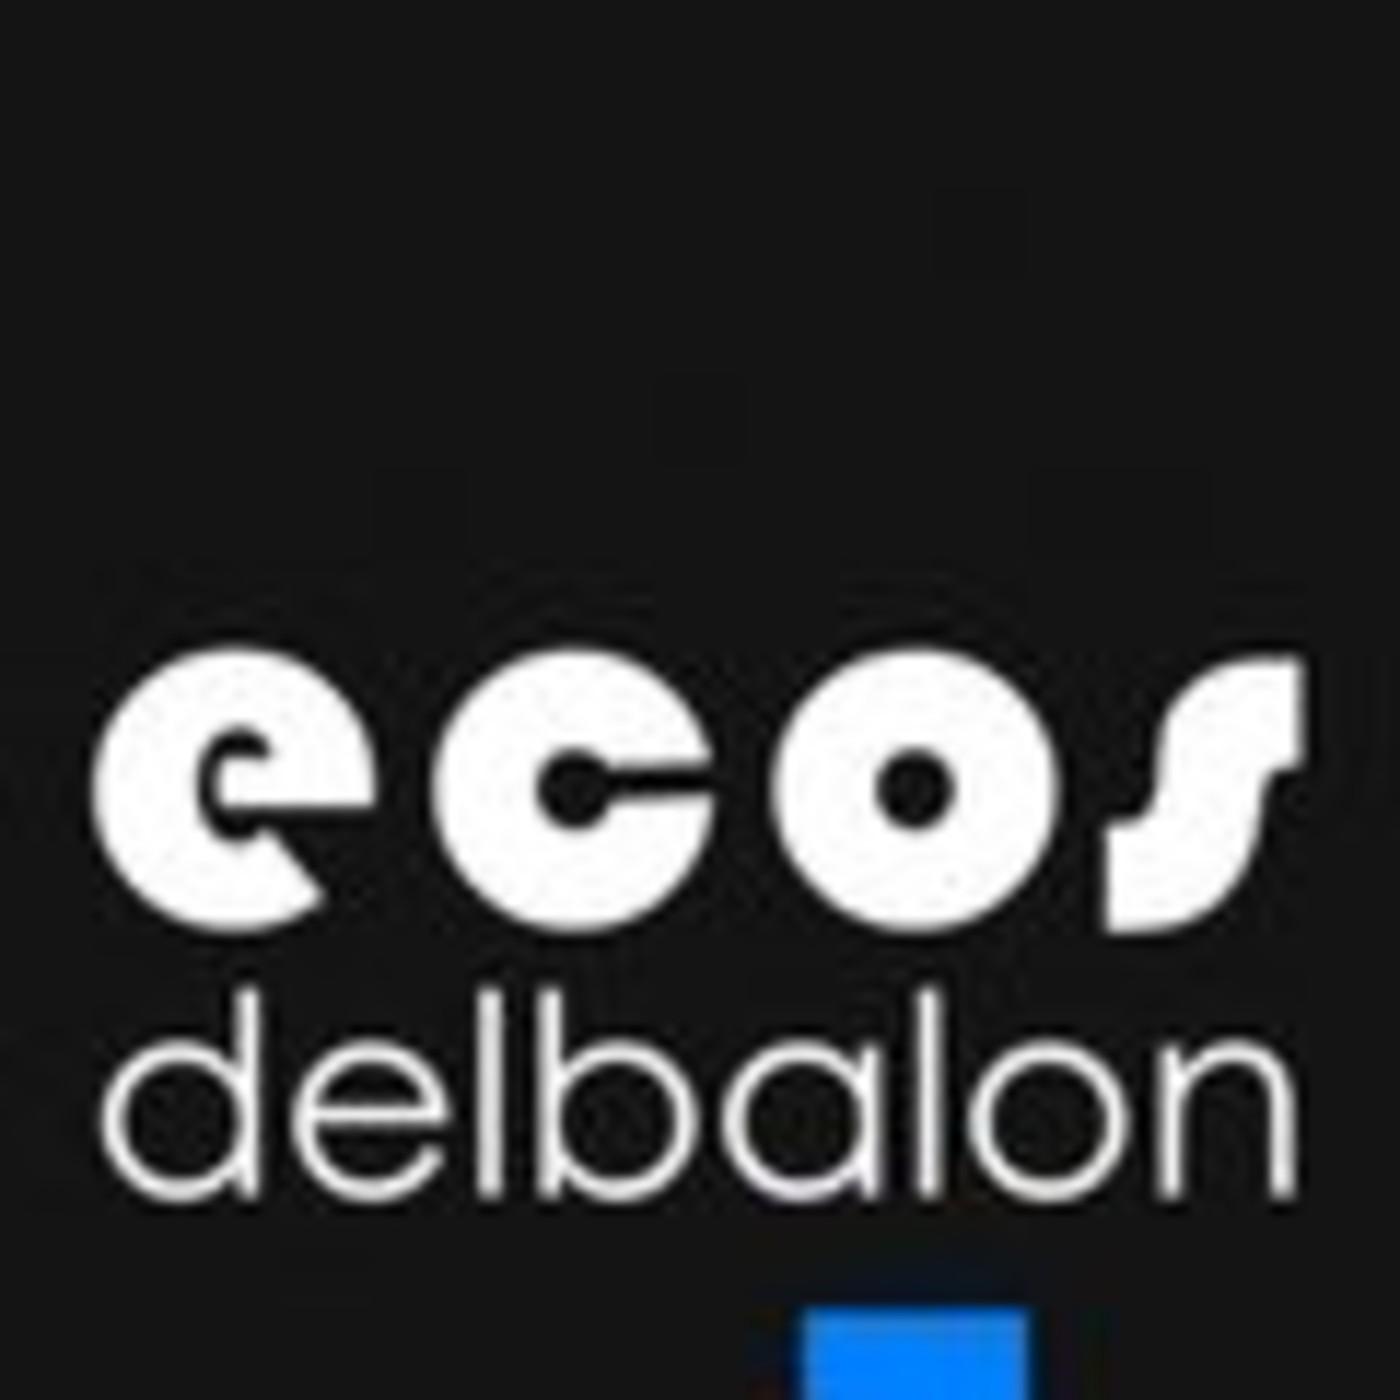 ecosdelbalon